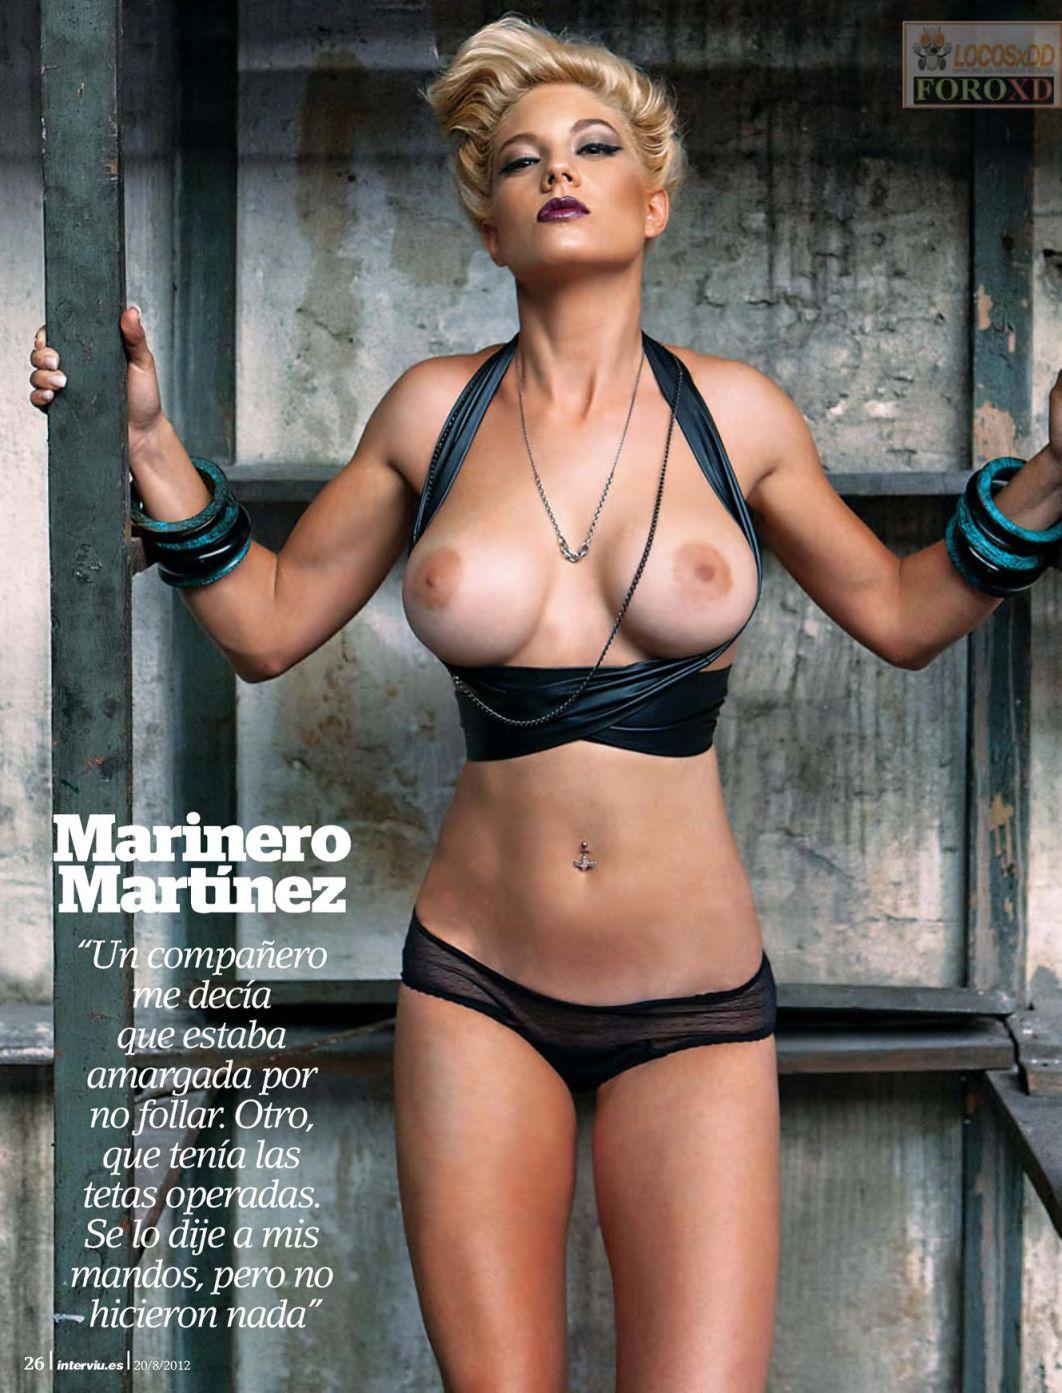 Meritxell Martinez On The Cover Of Interviu Magazine Nsfwpics  Bootymotiontv-5419